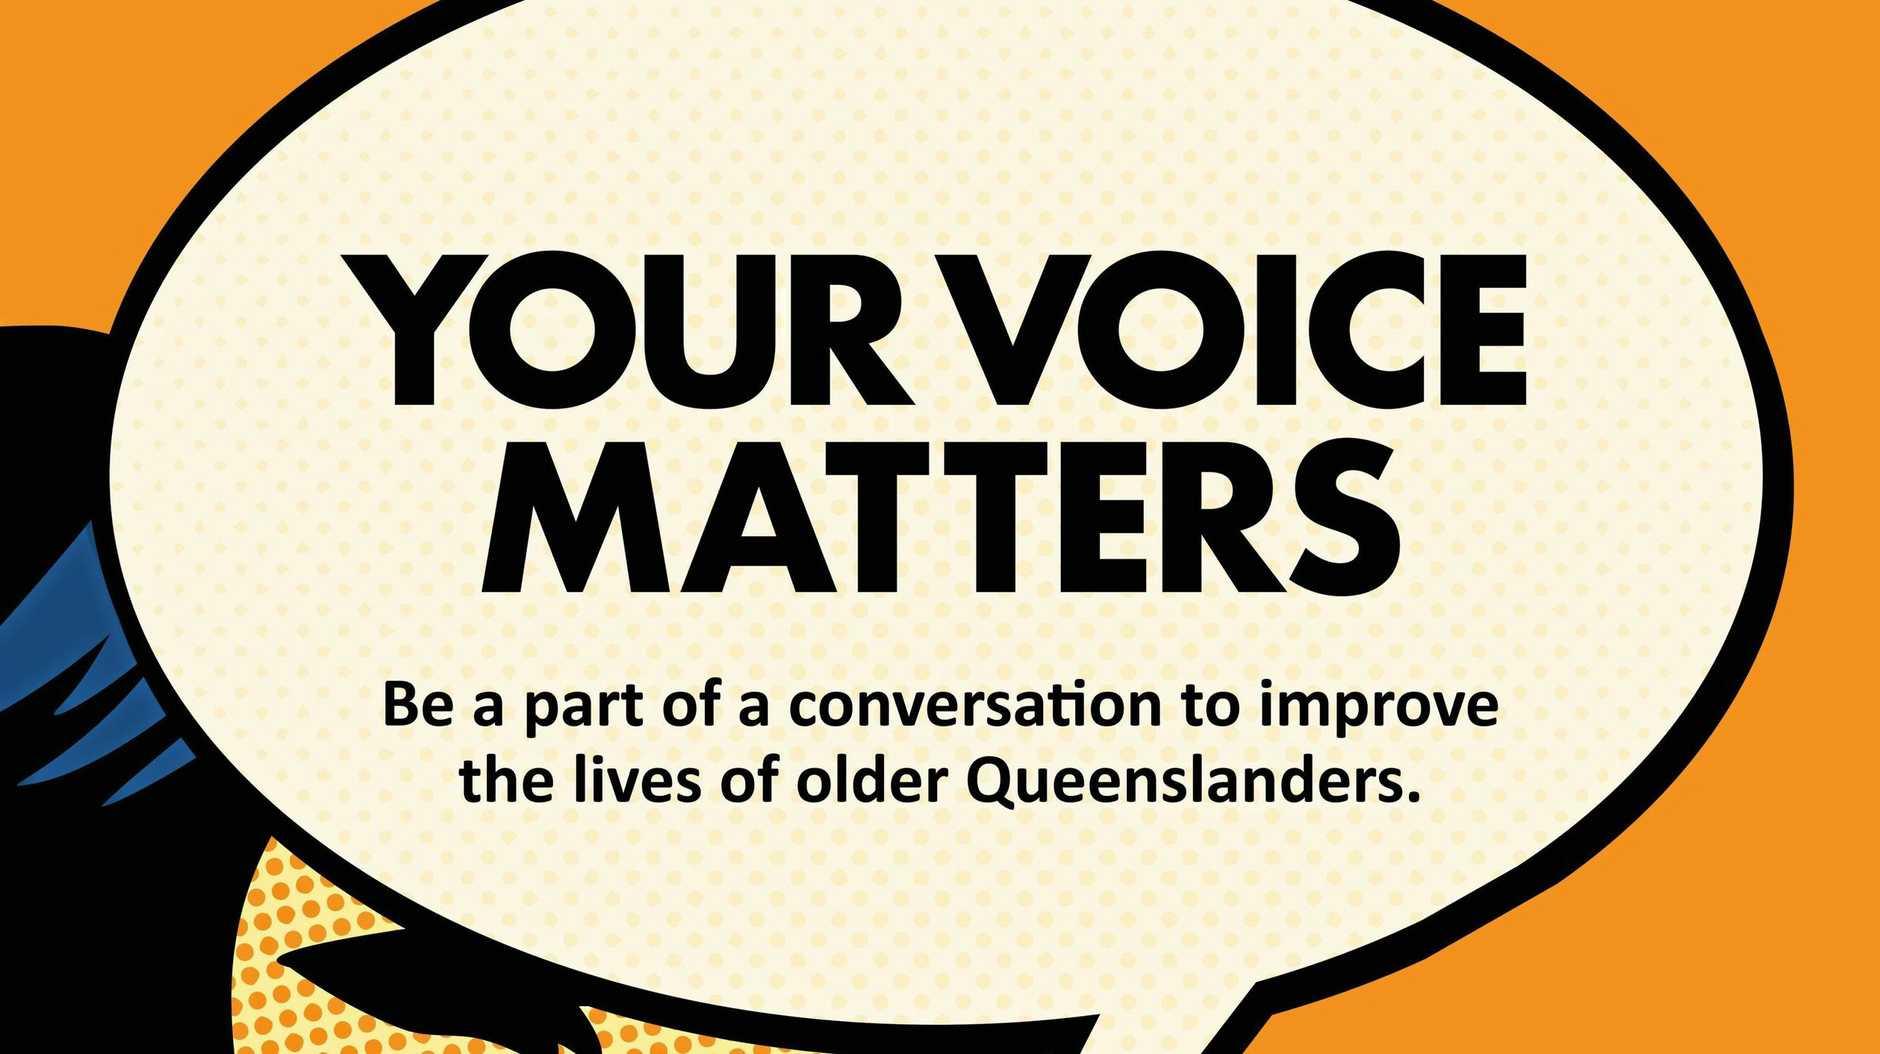 COTA - Call for community conversations